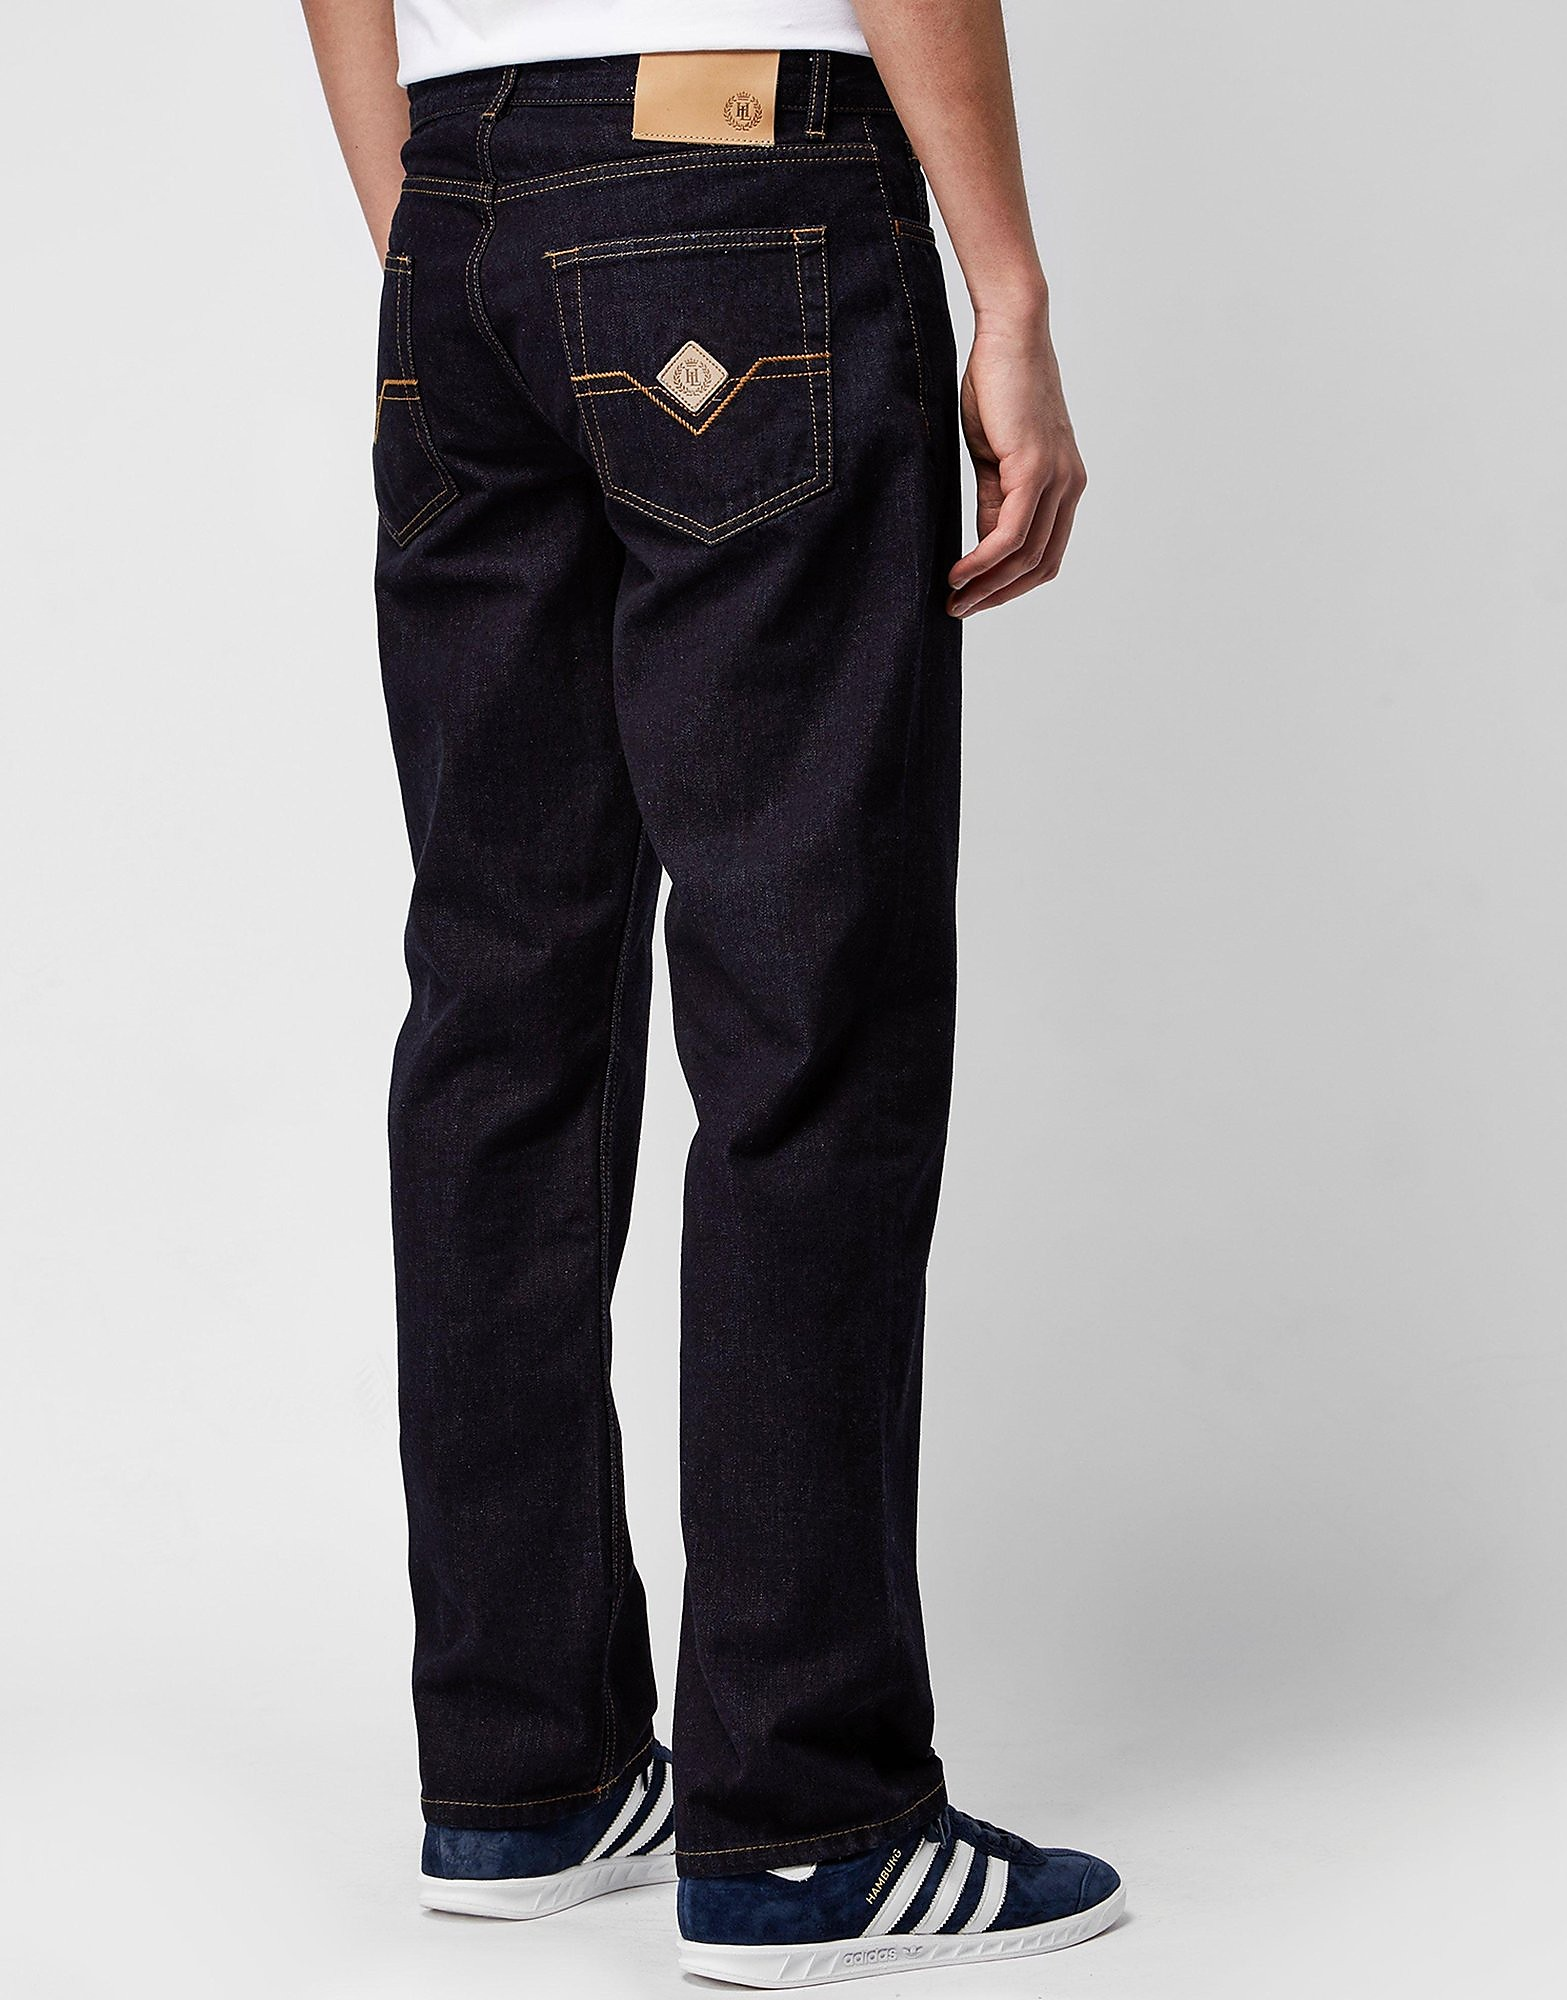 Henri Lloyd Dail Classic Rinse Regular Leg Jean